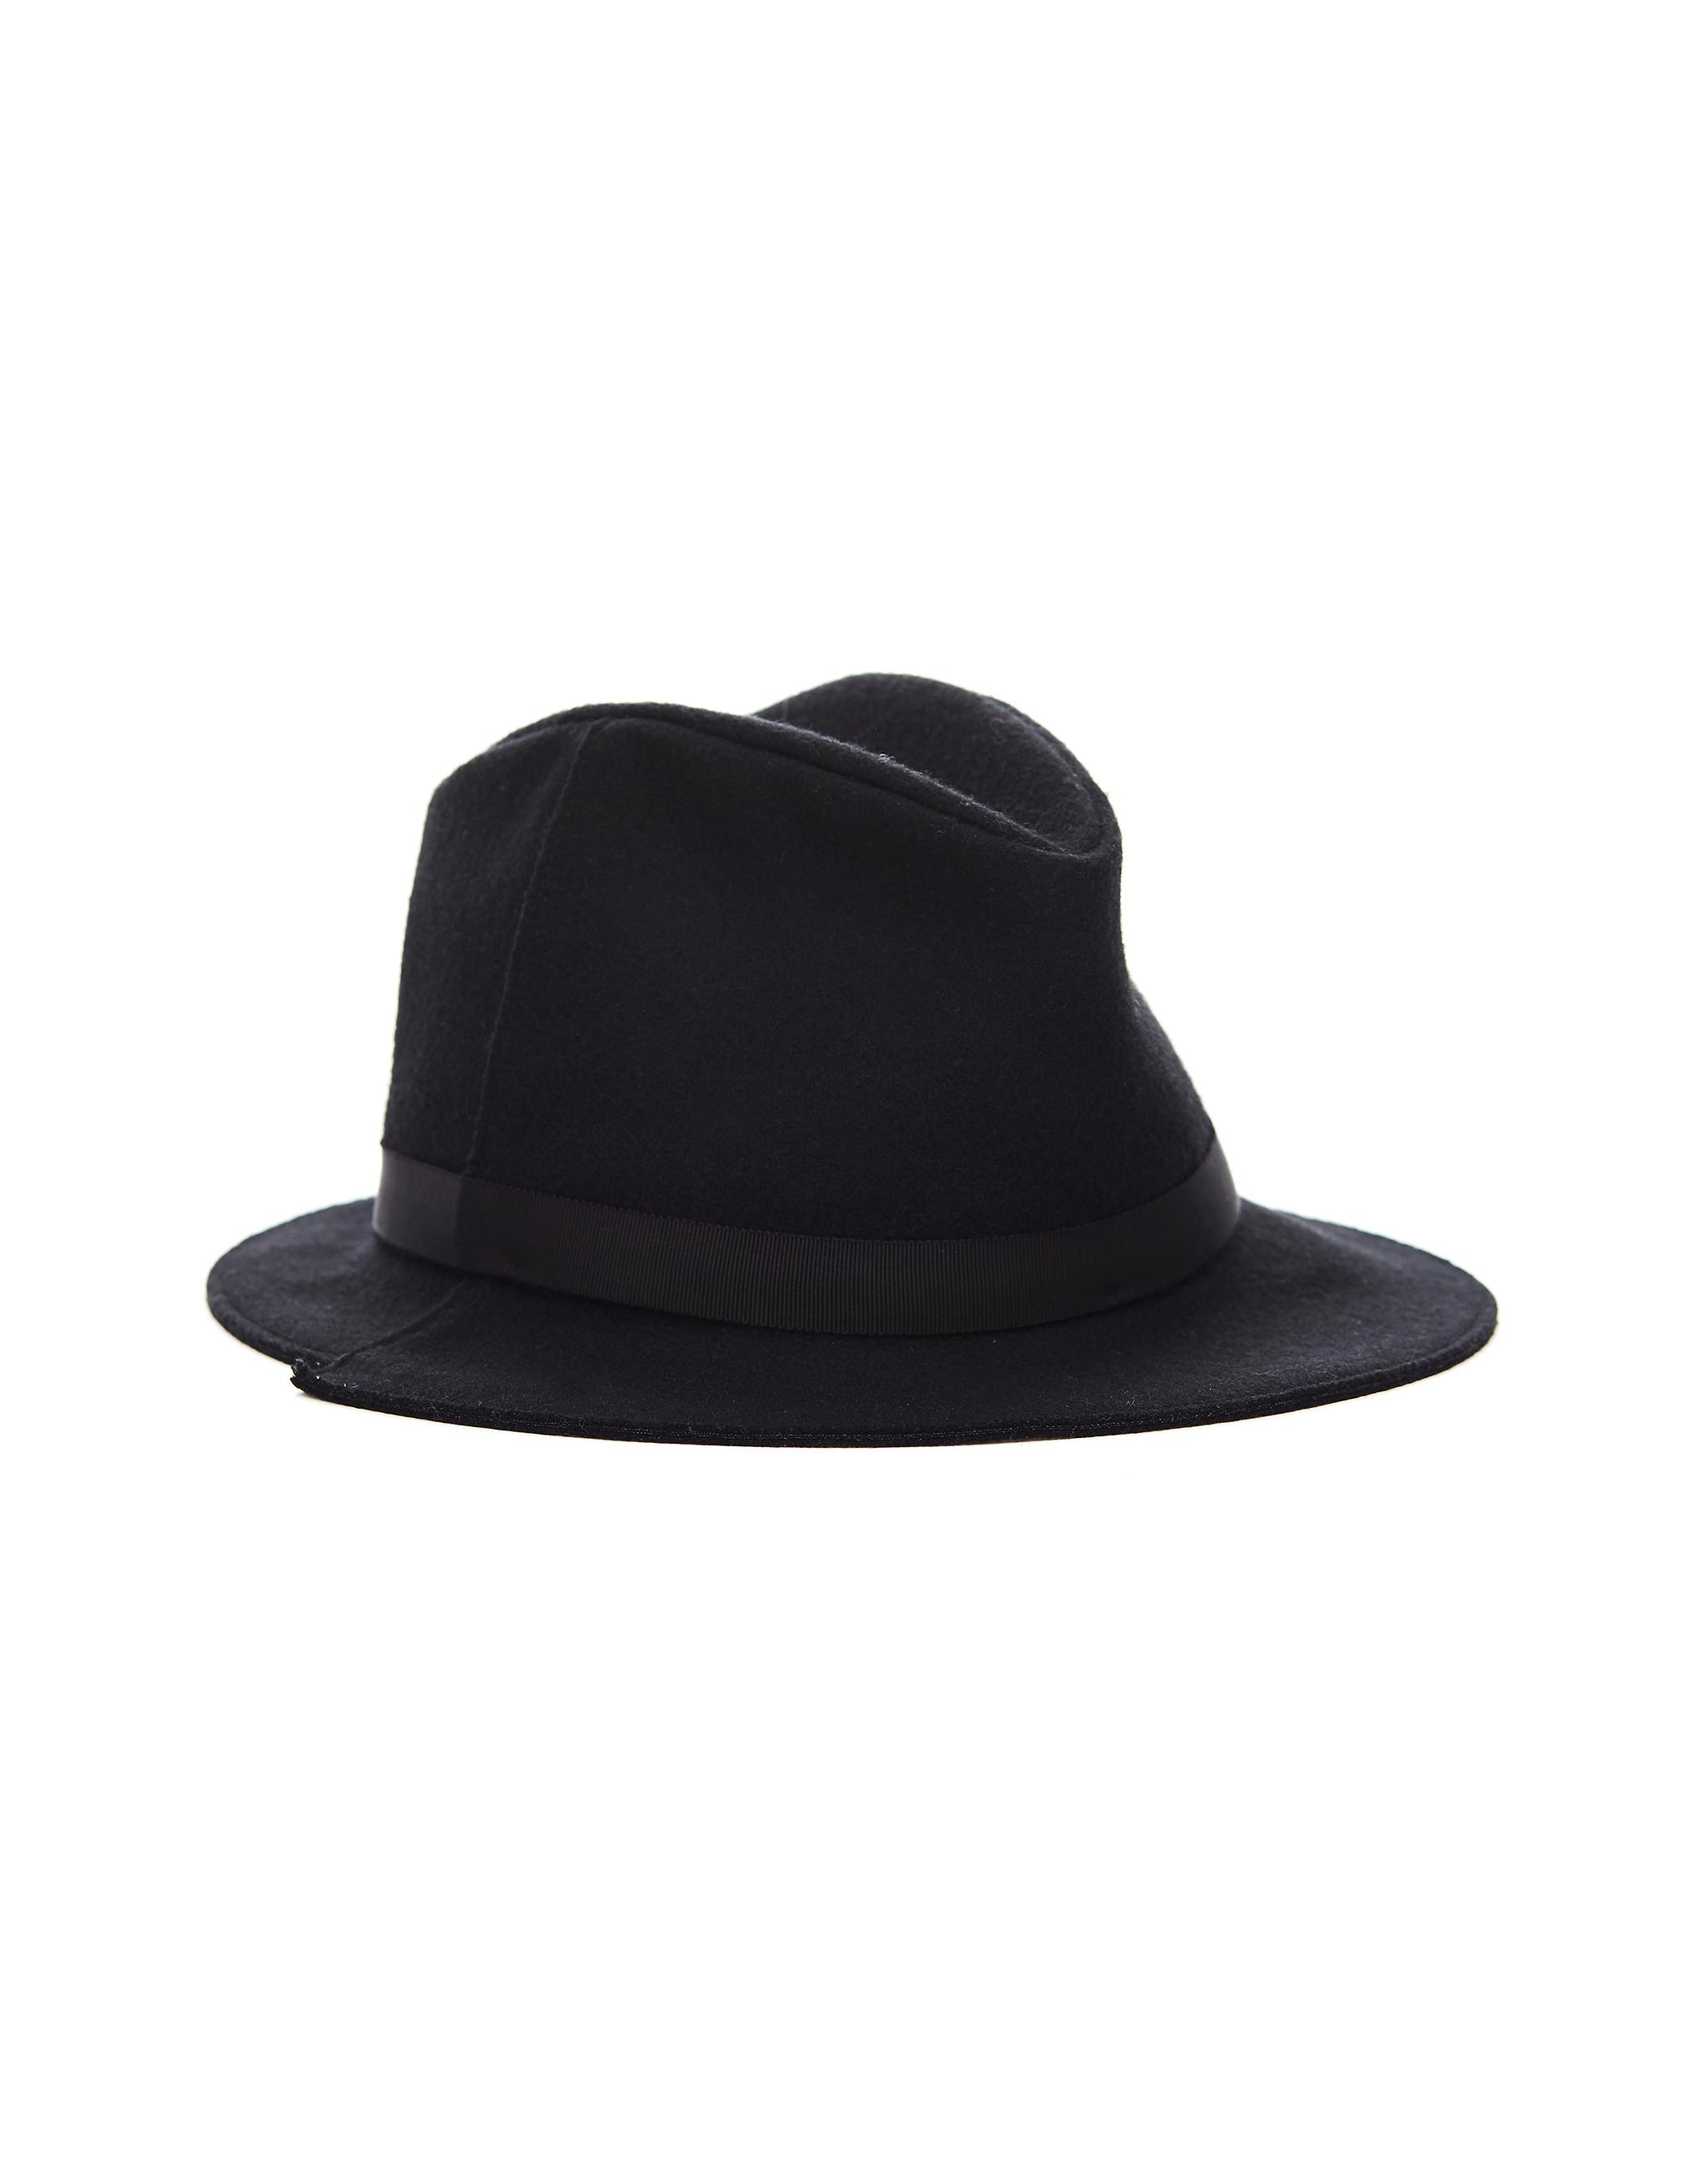 ef6b963b200 Lyst - Yohji Yamamoto Black Wool Hat in Black